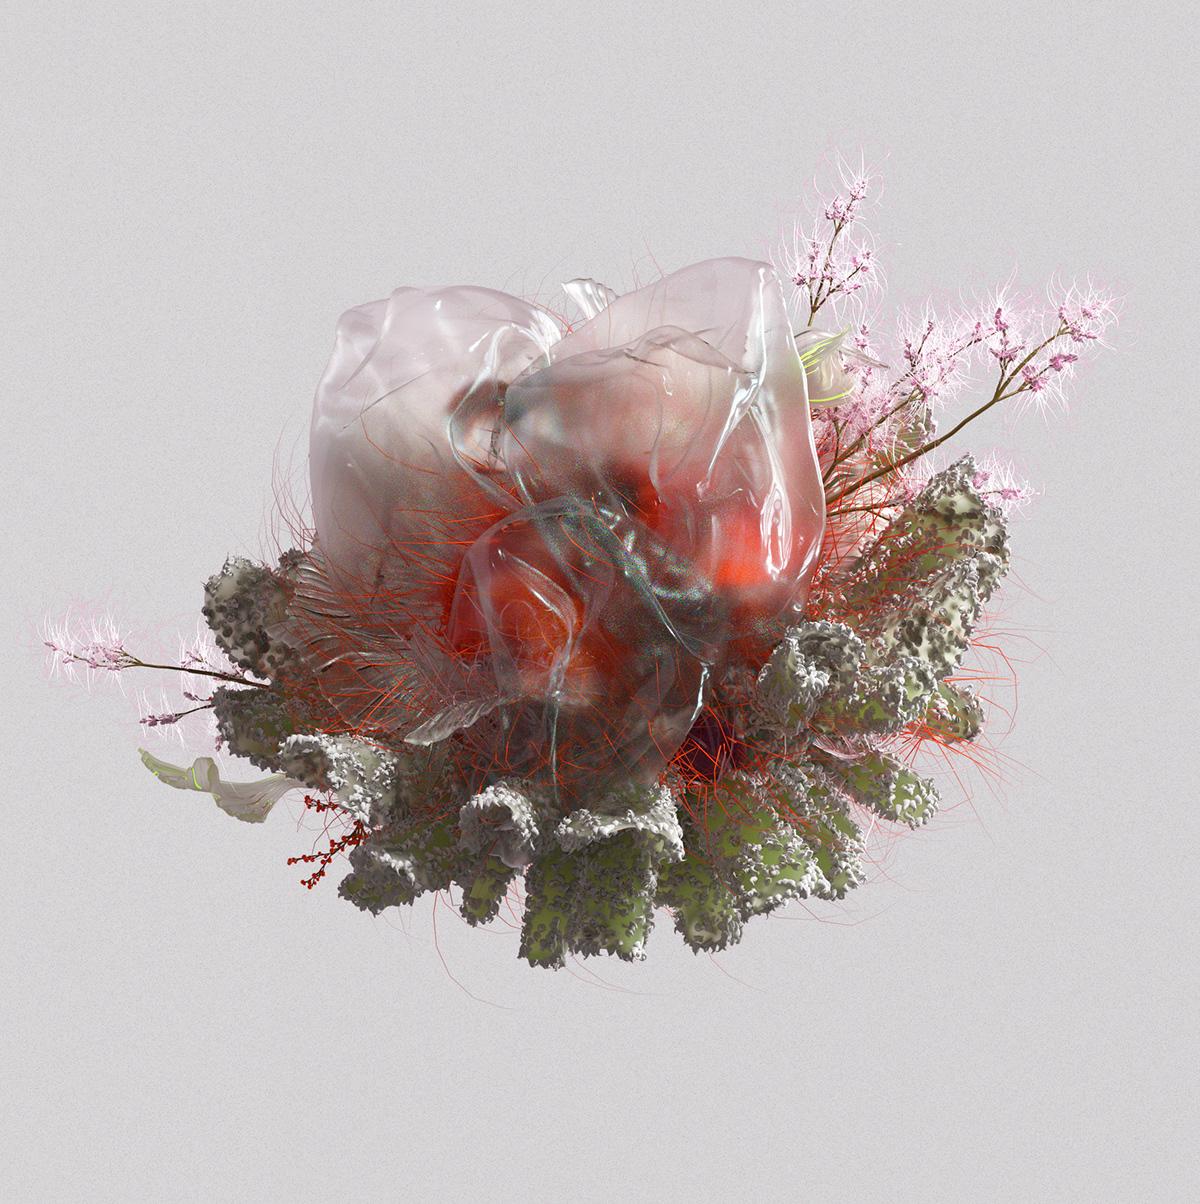 c4d flower motion cinema4d 3D graphics setdesign abstract organic Nature